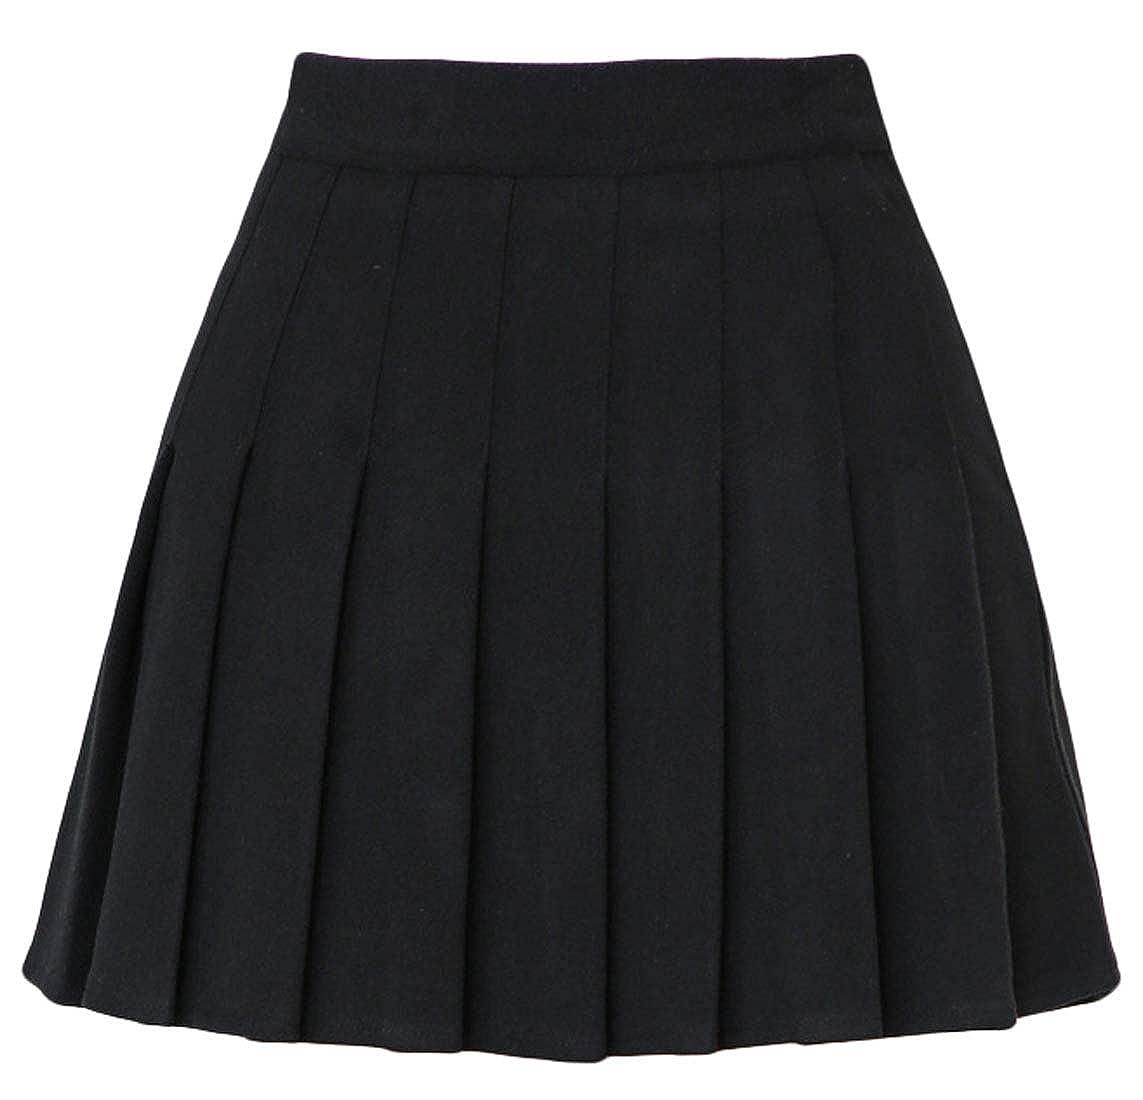 a8bae591ab chouyatou Women's High Waist A-Line Flare Pleated Mini Wool Skirt at Amazon  Women's Clothing store: